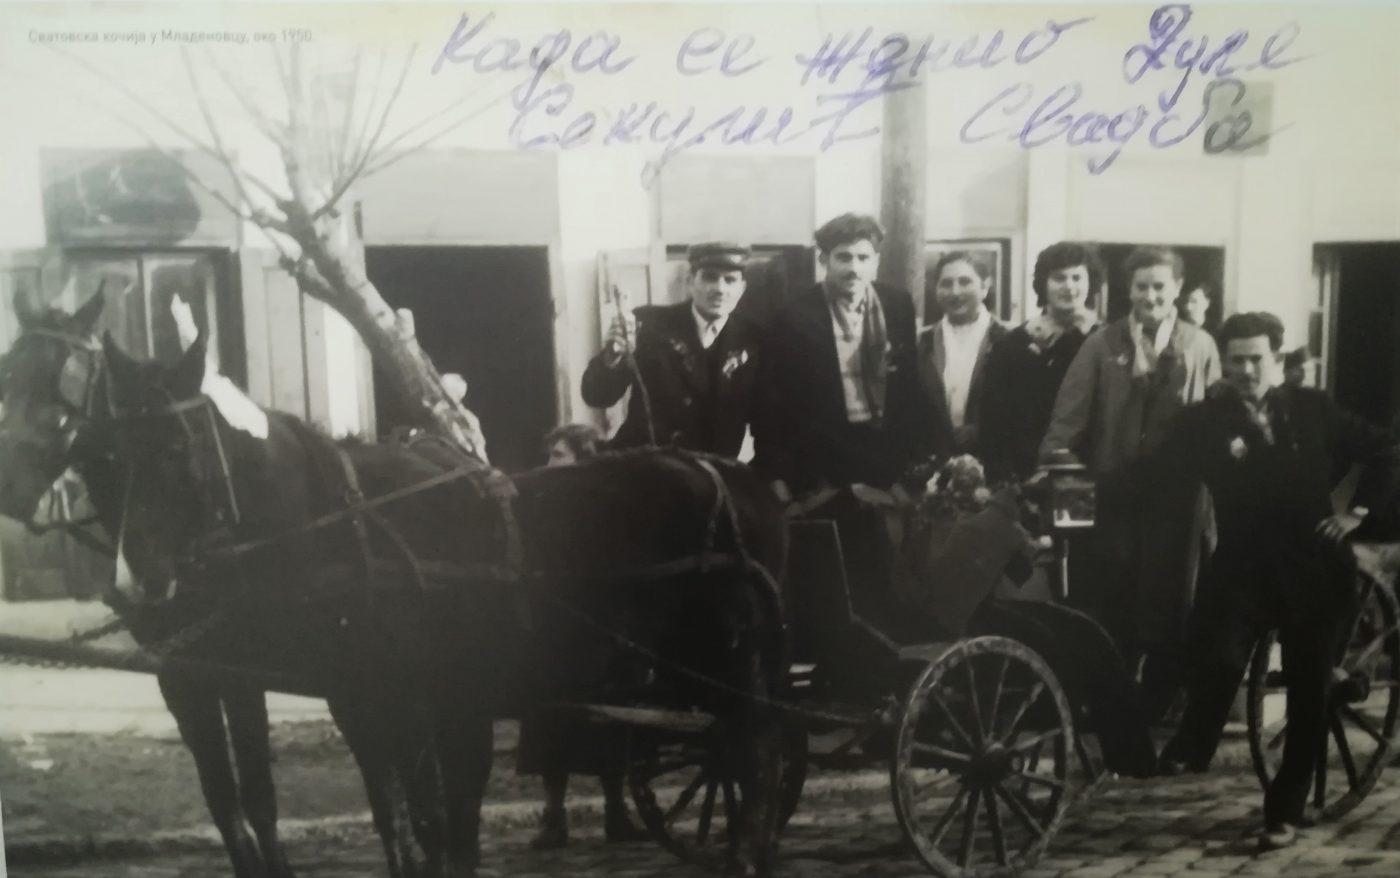 Narodni muzej Aranđelovac, Muzej grada Beograda